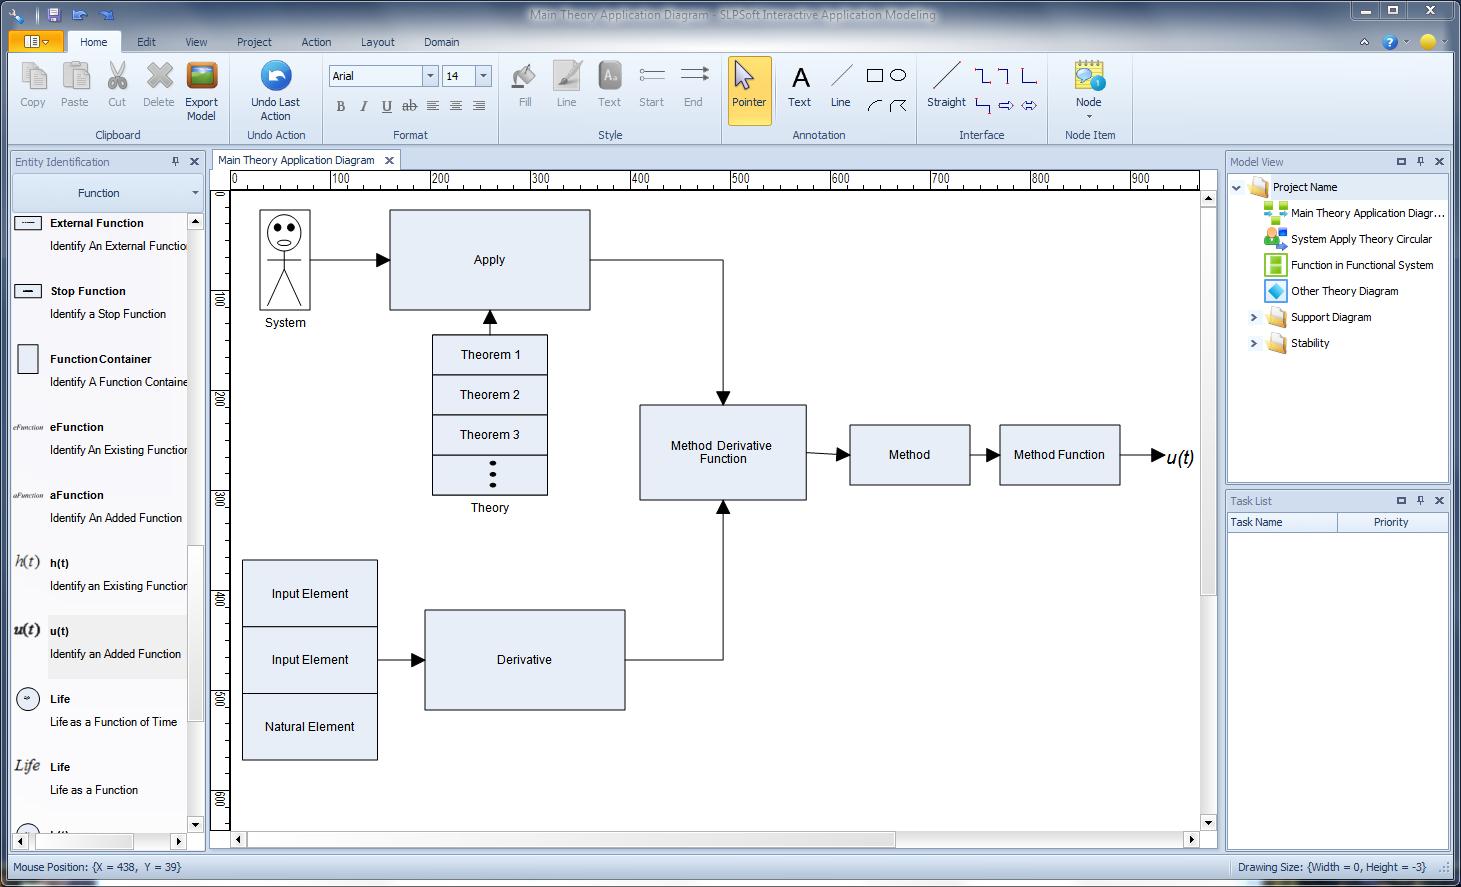 Click to view SLPSoft Interactive Application Modeling V2012 2012 screenshot